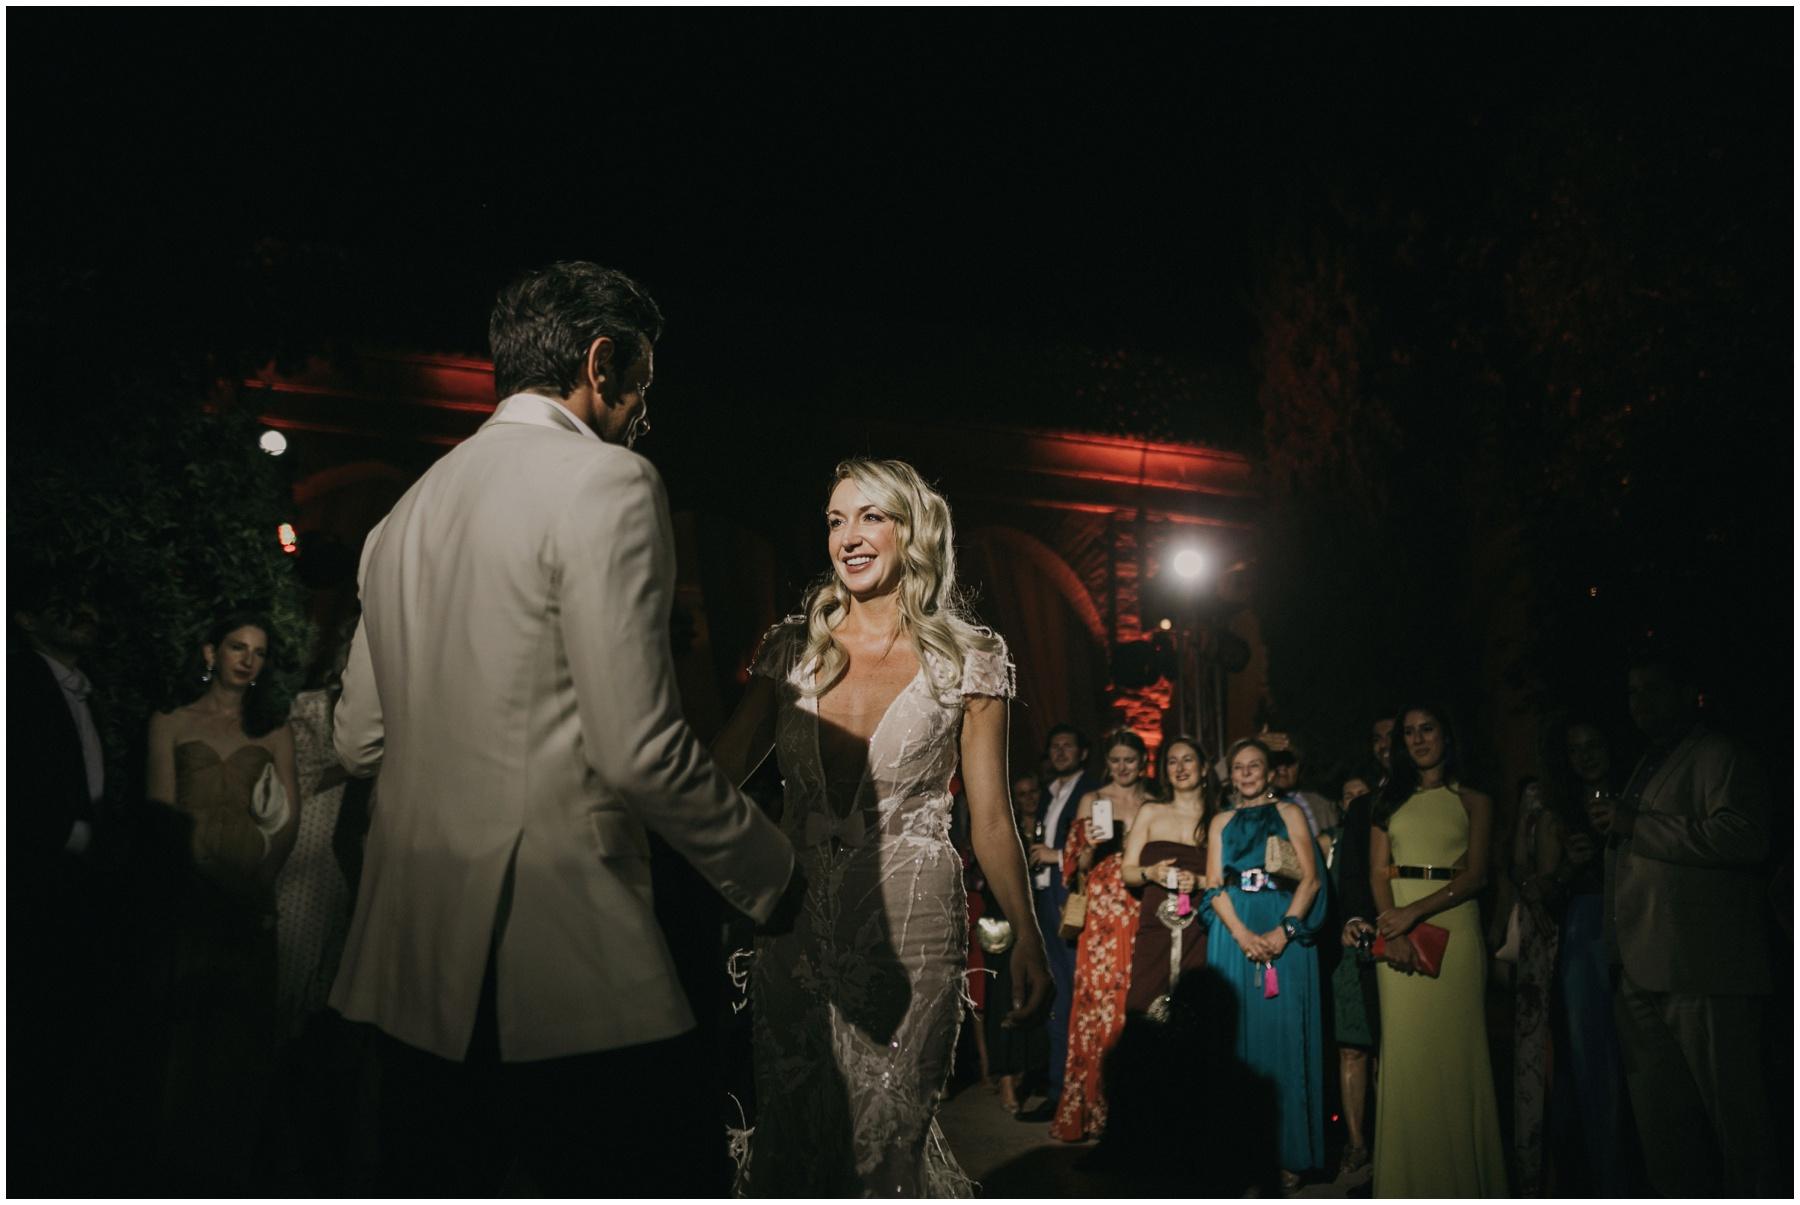 Marrakech Wedding Beldi Coutry Club 074.JPG